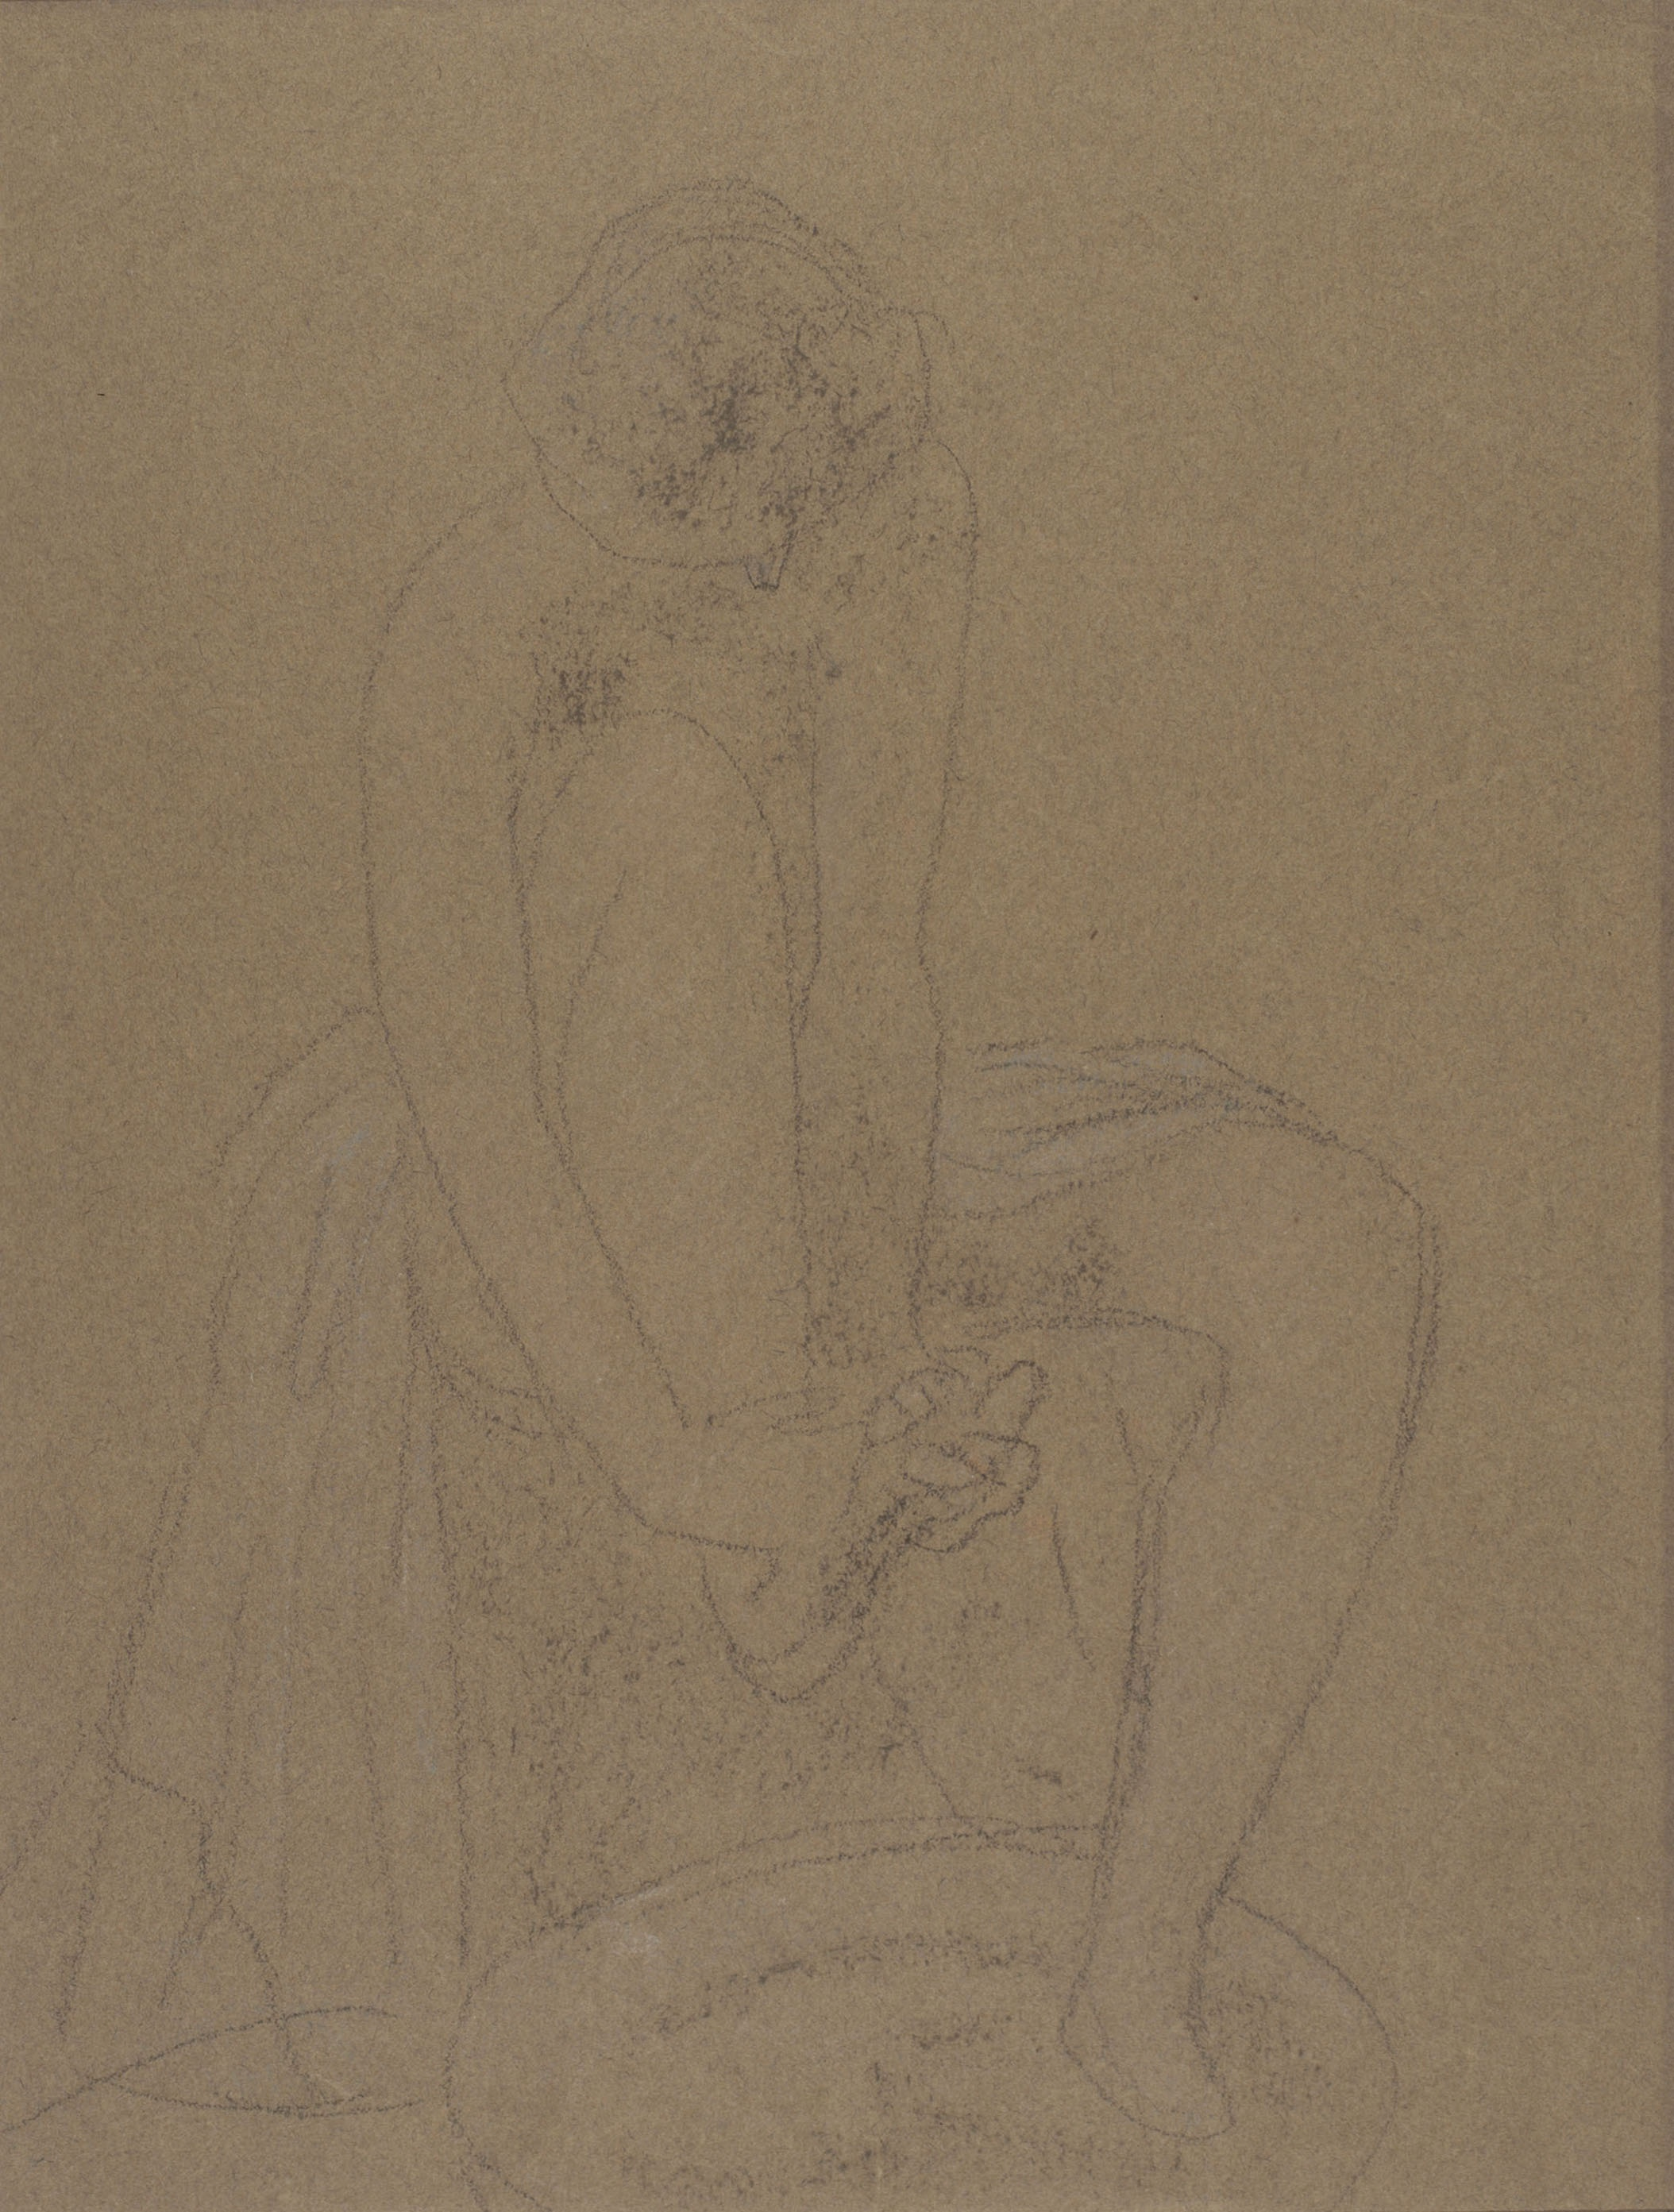 Juli González - El bany de peus (Le bain de pieds) - Cap a 1910-1918